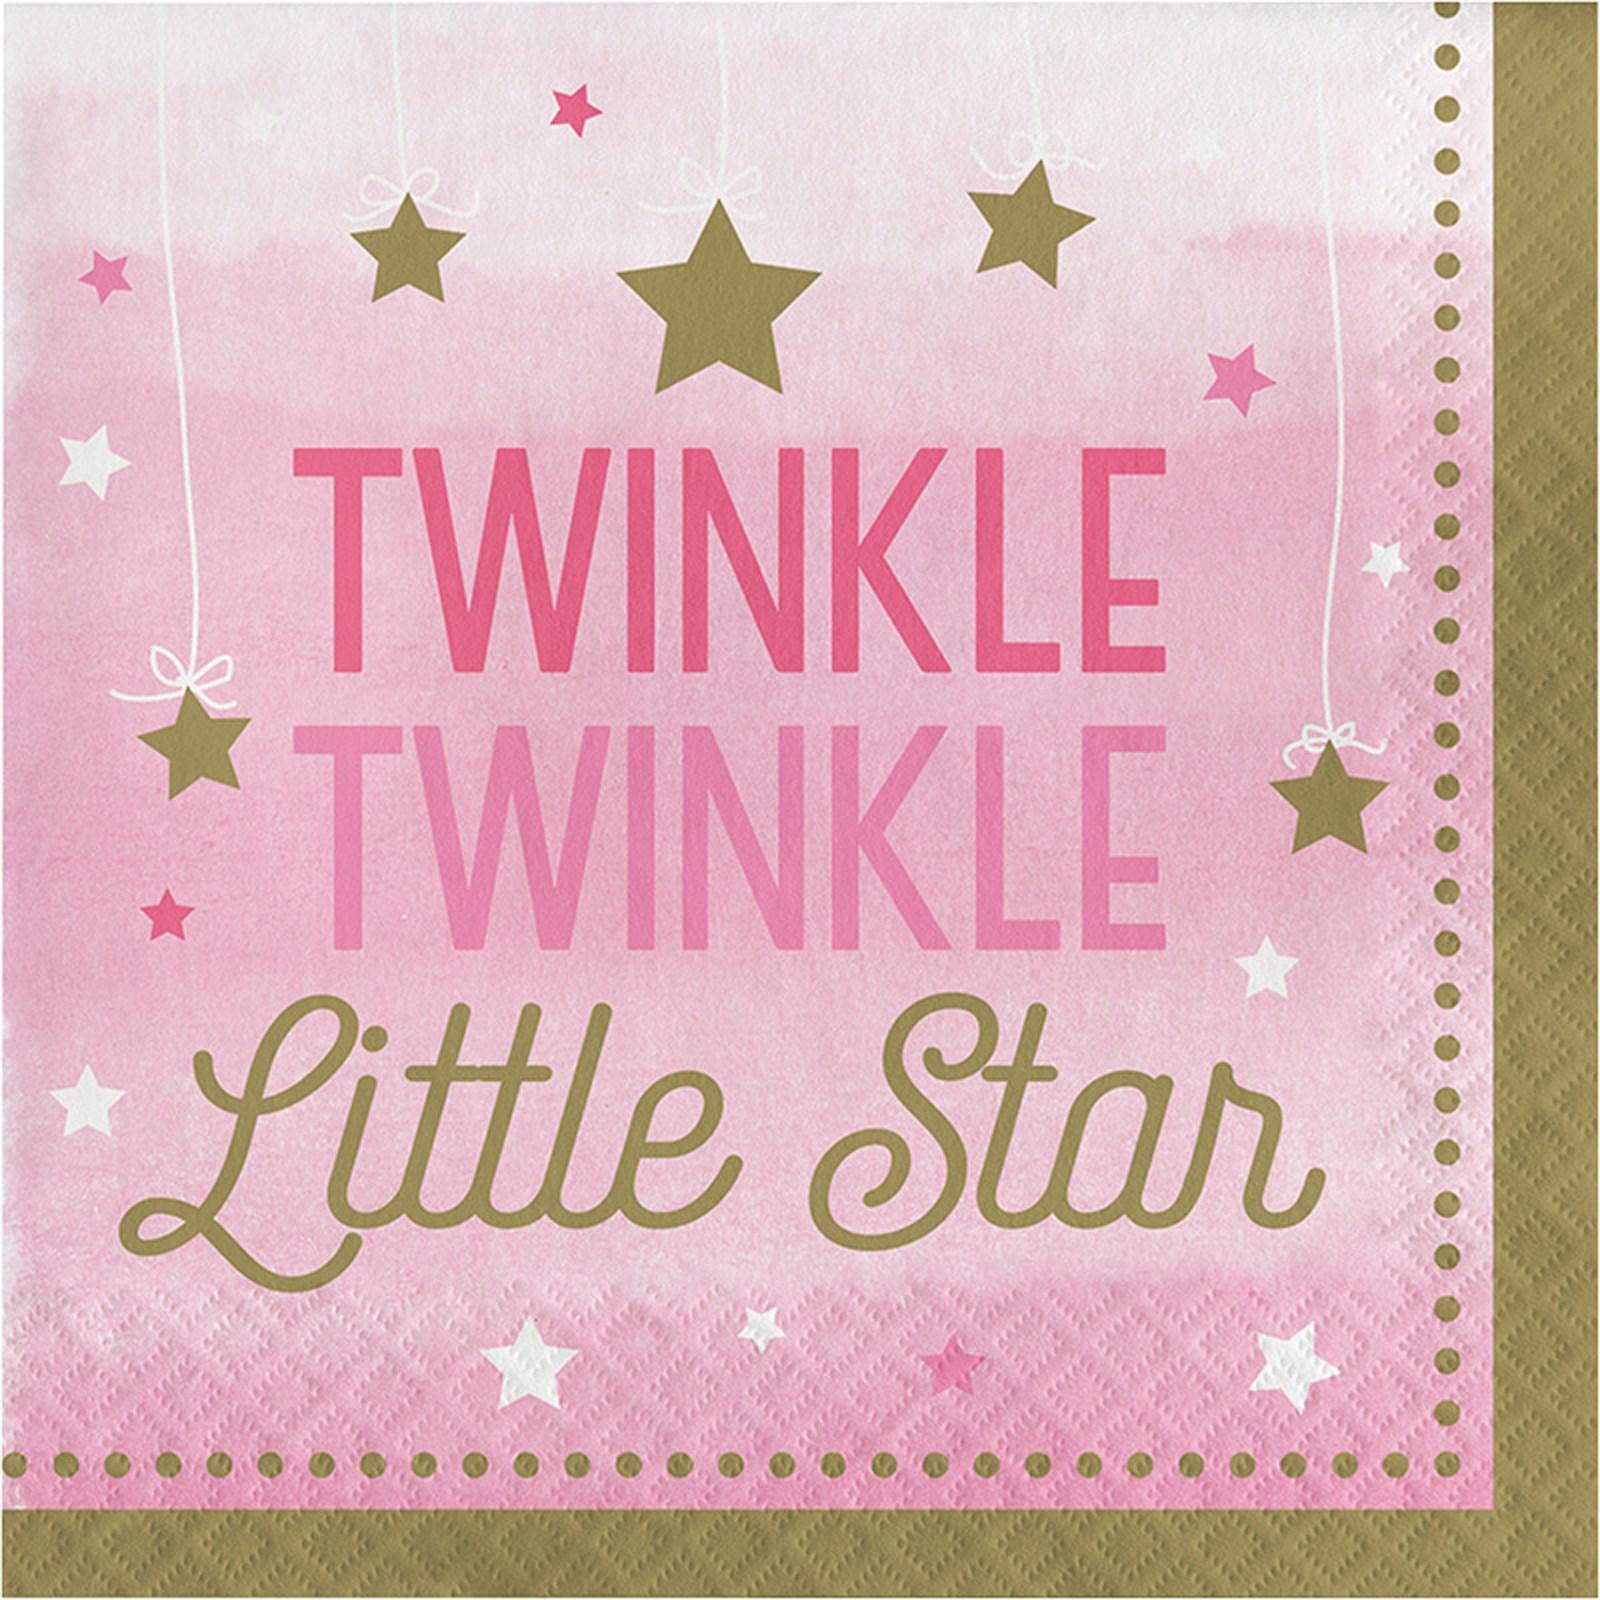 Twinkle Twinkle Little Star Pink Lunch Napkins 16